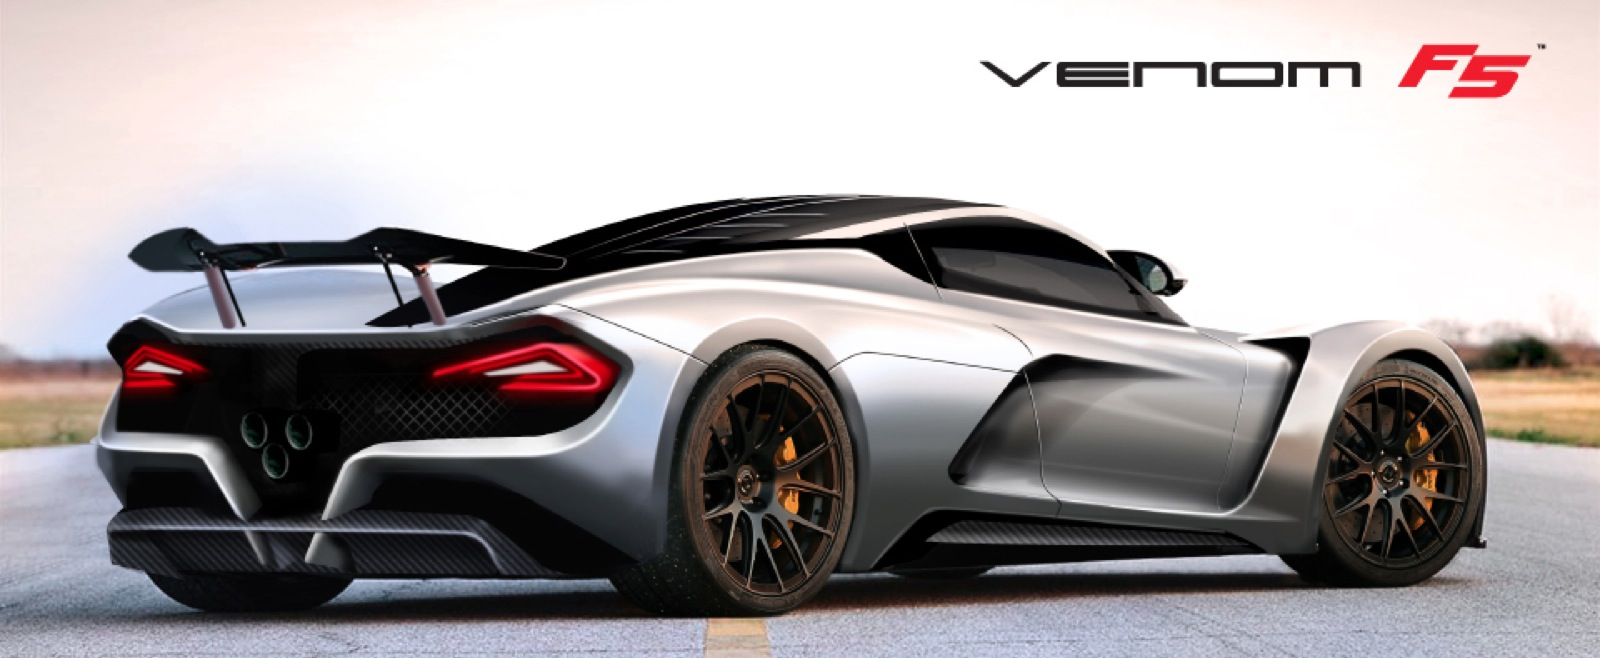 Hennessey Venom F5 01